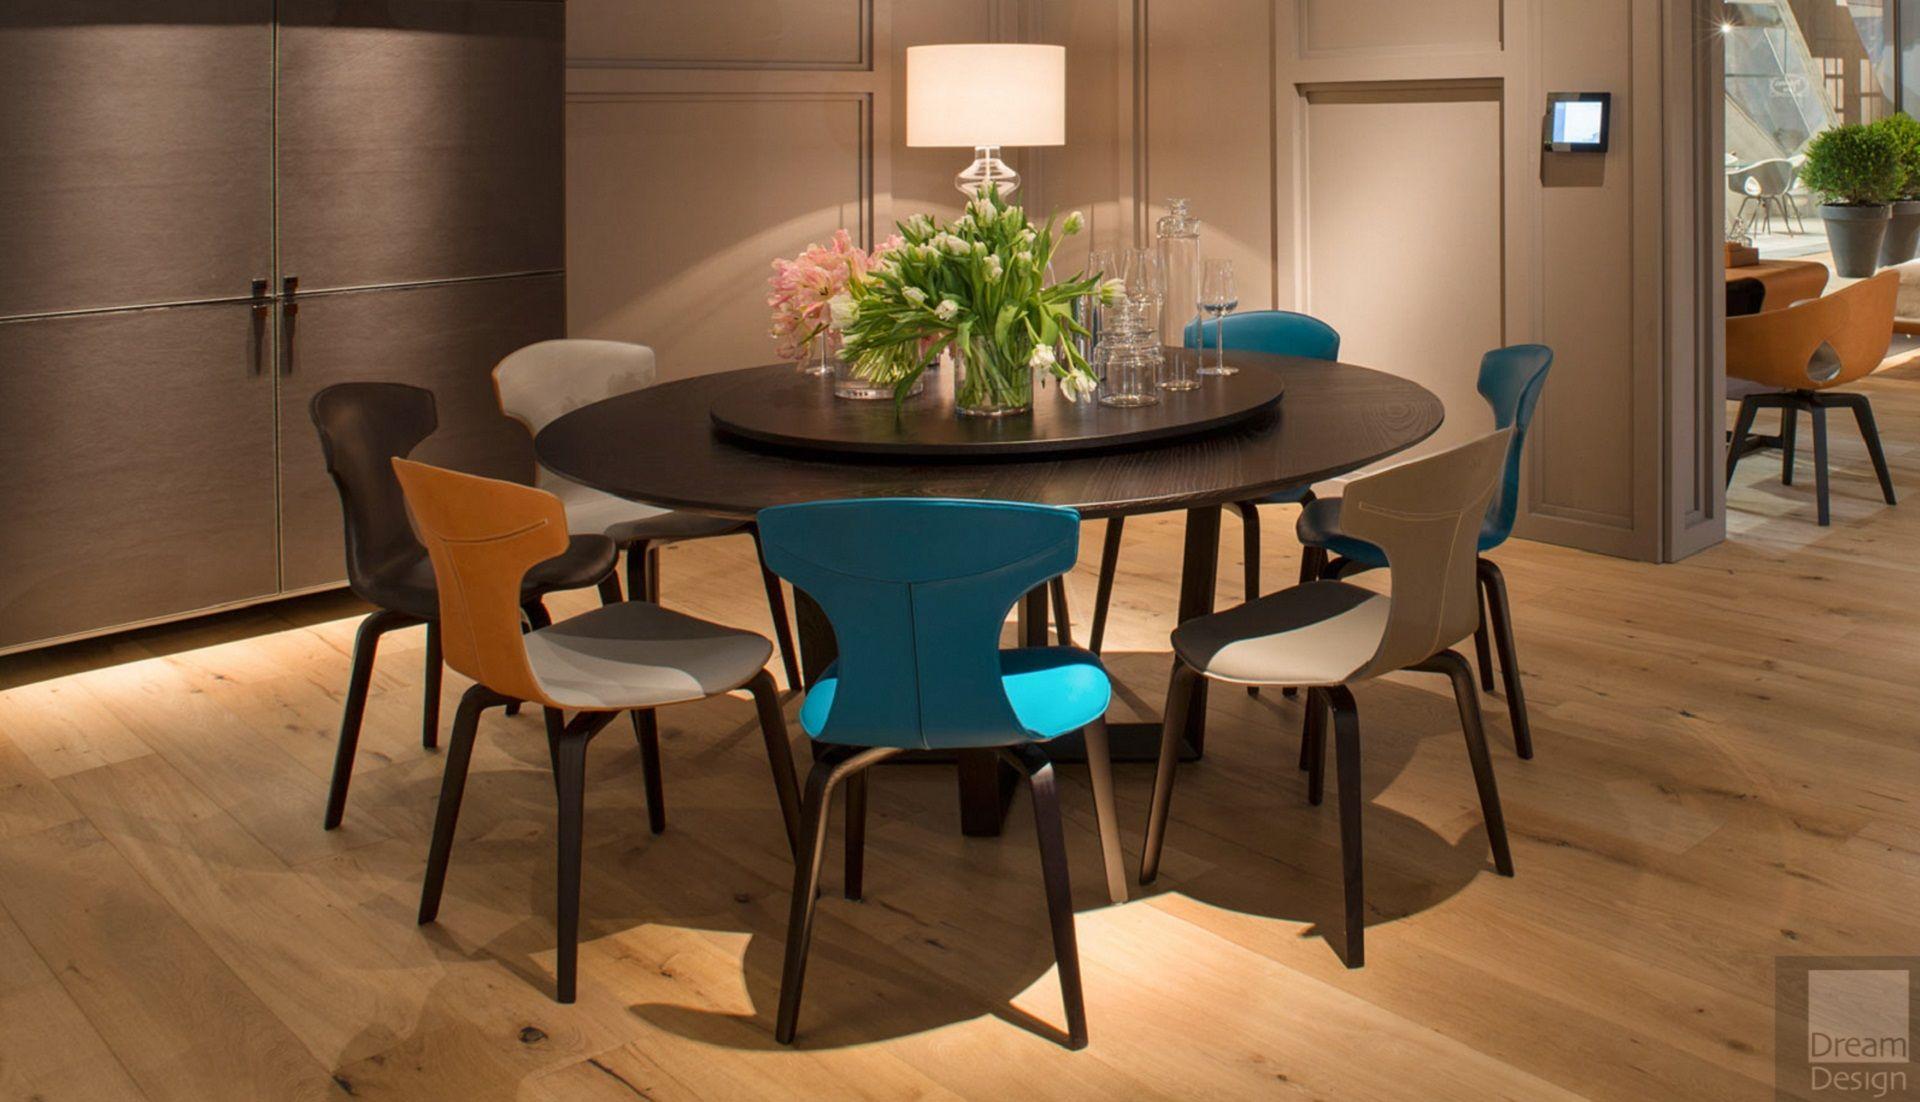 Poltrona frau montera chair everything but ordinary for Poltrona frau